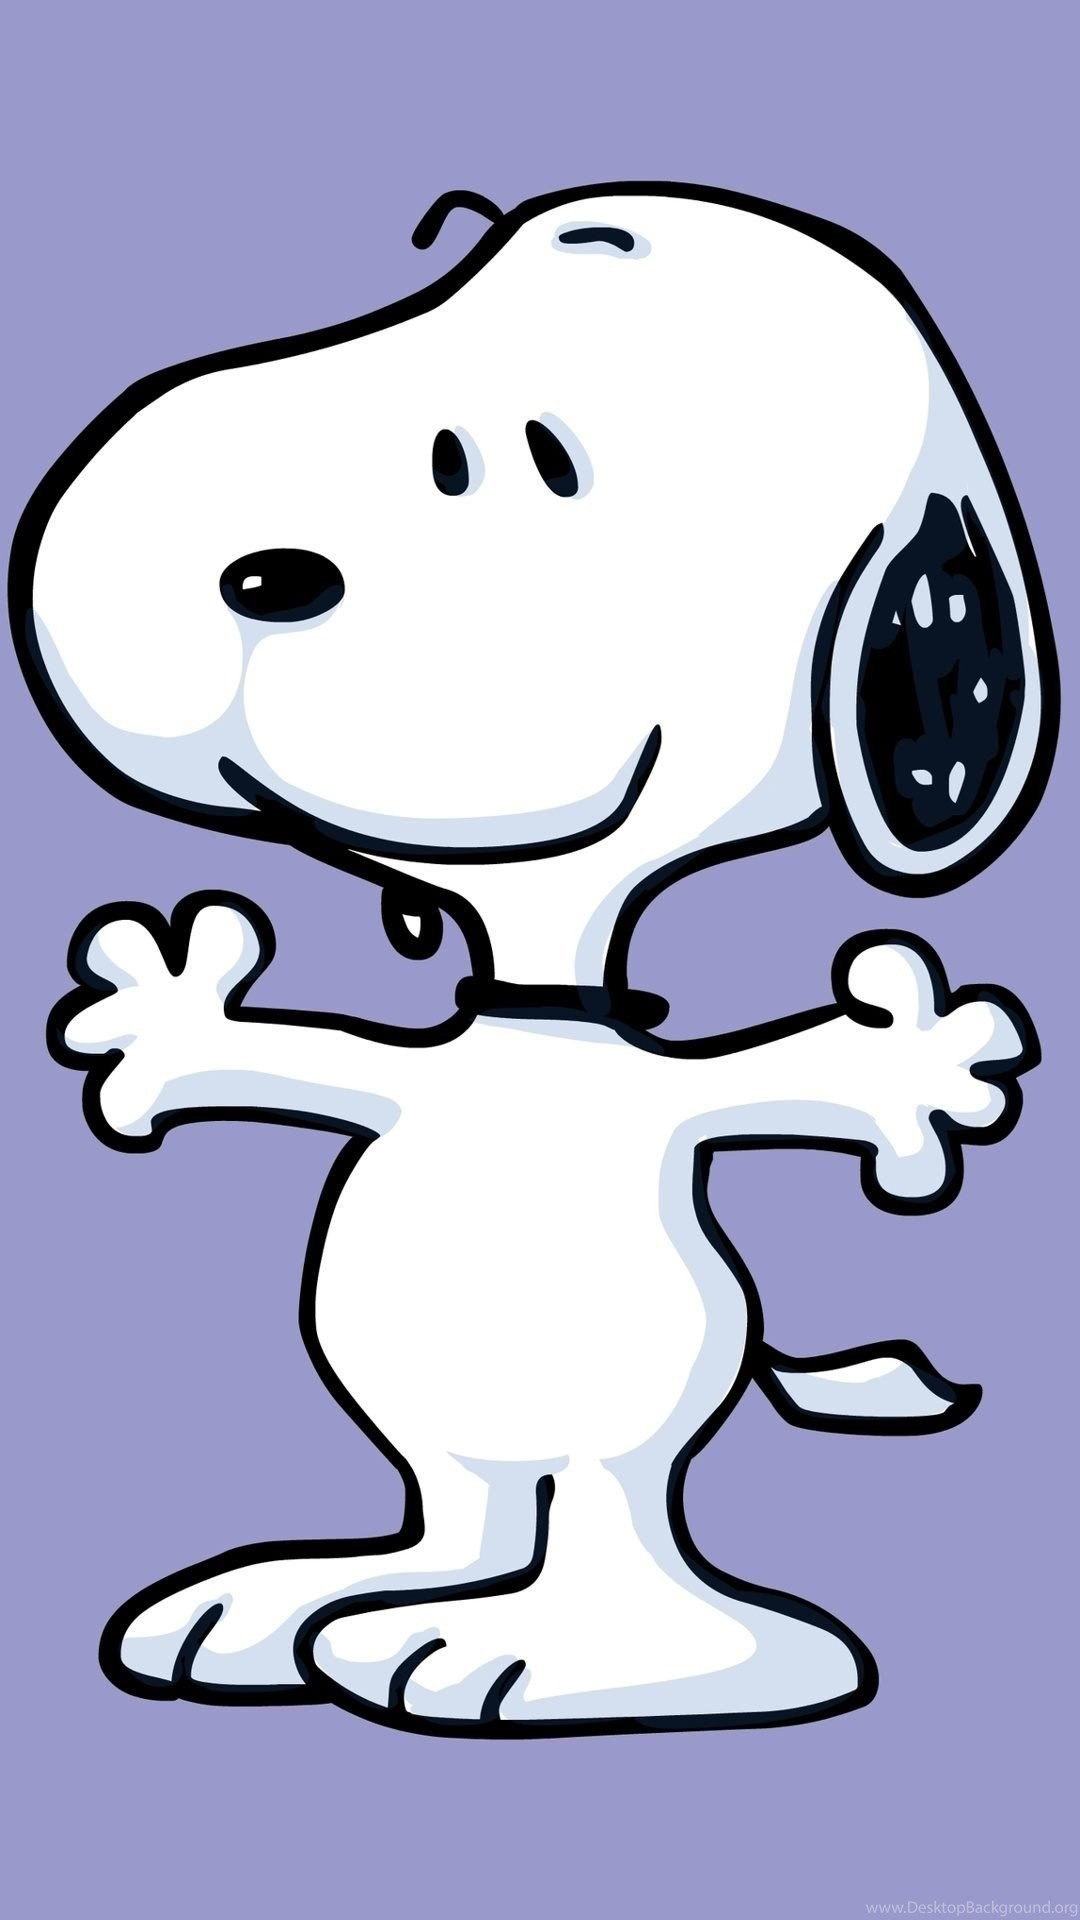 Drawn Cartoons Snoopy Iphone 6 Plus Wallpapers Cartoons Snoop